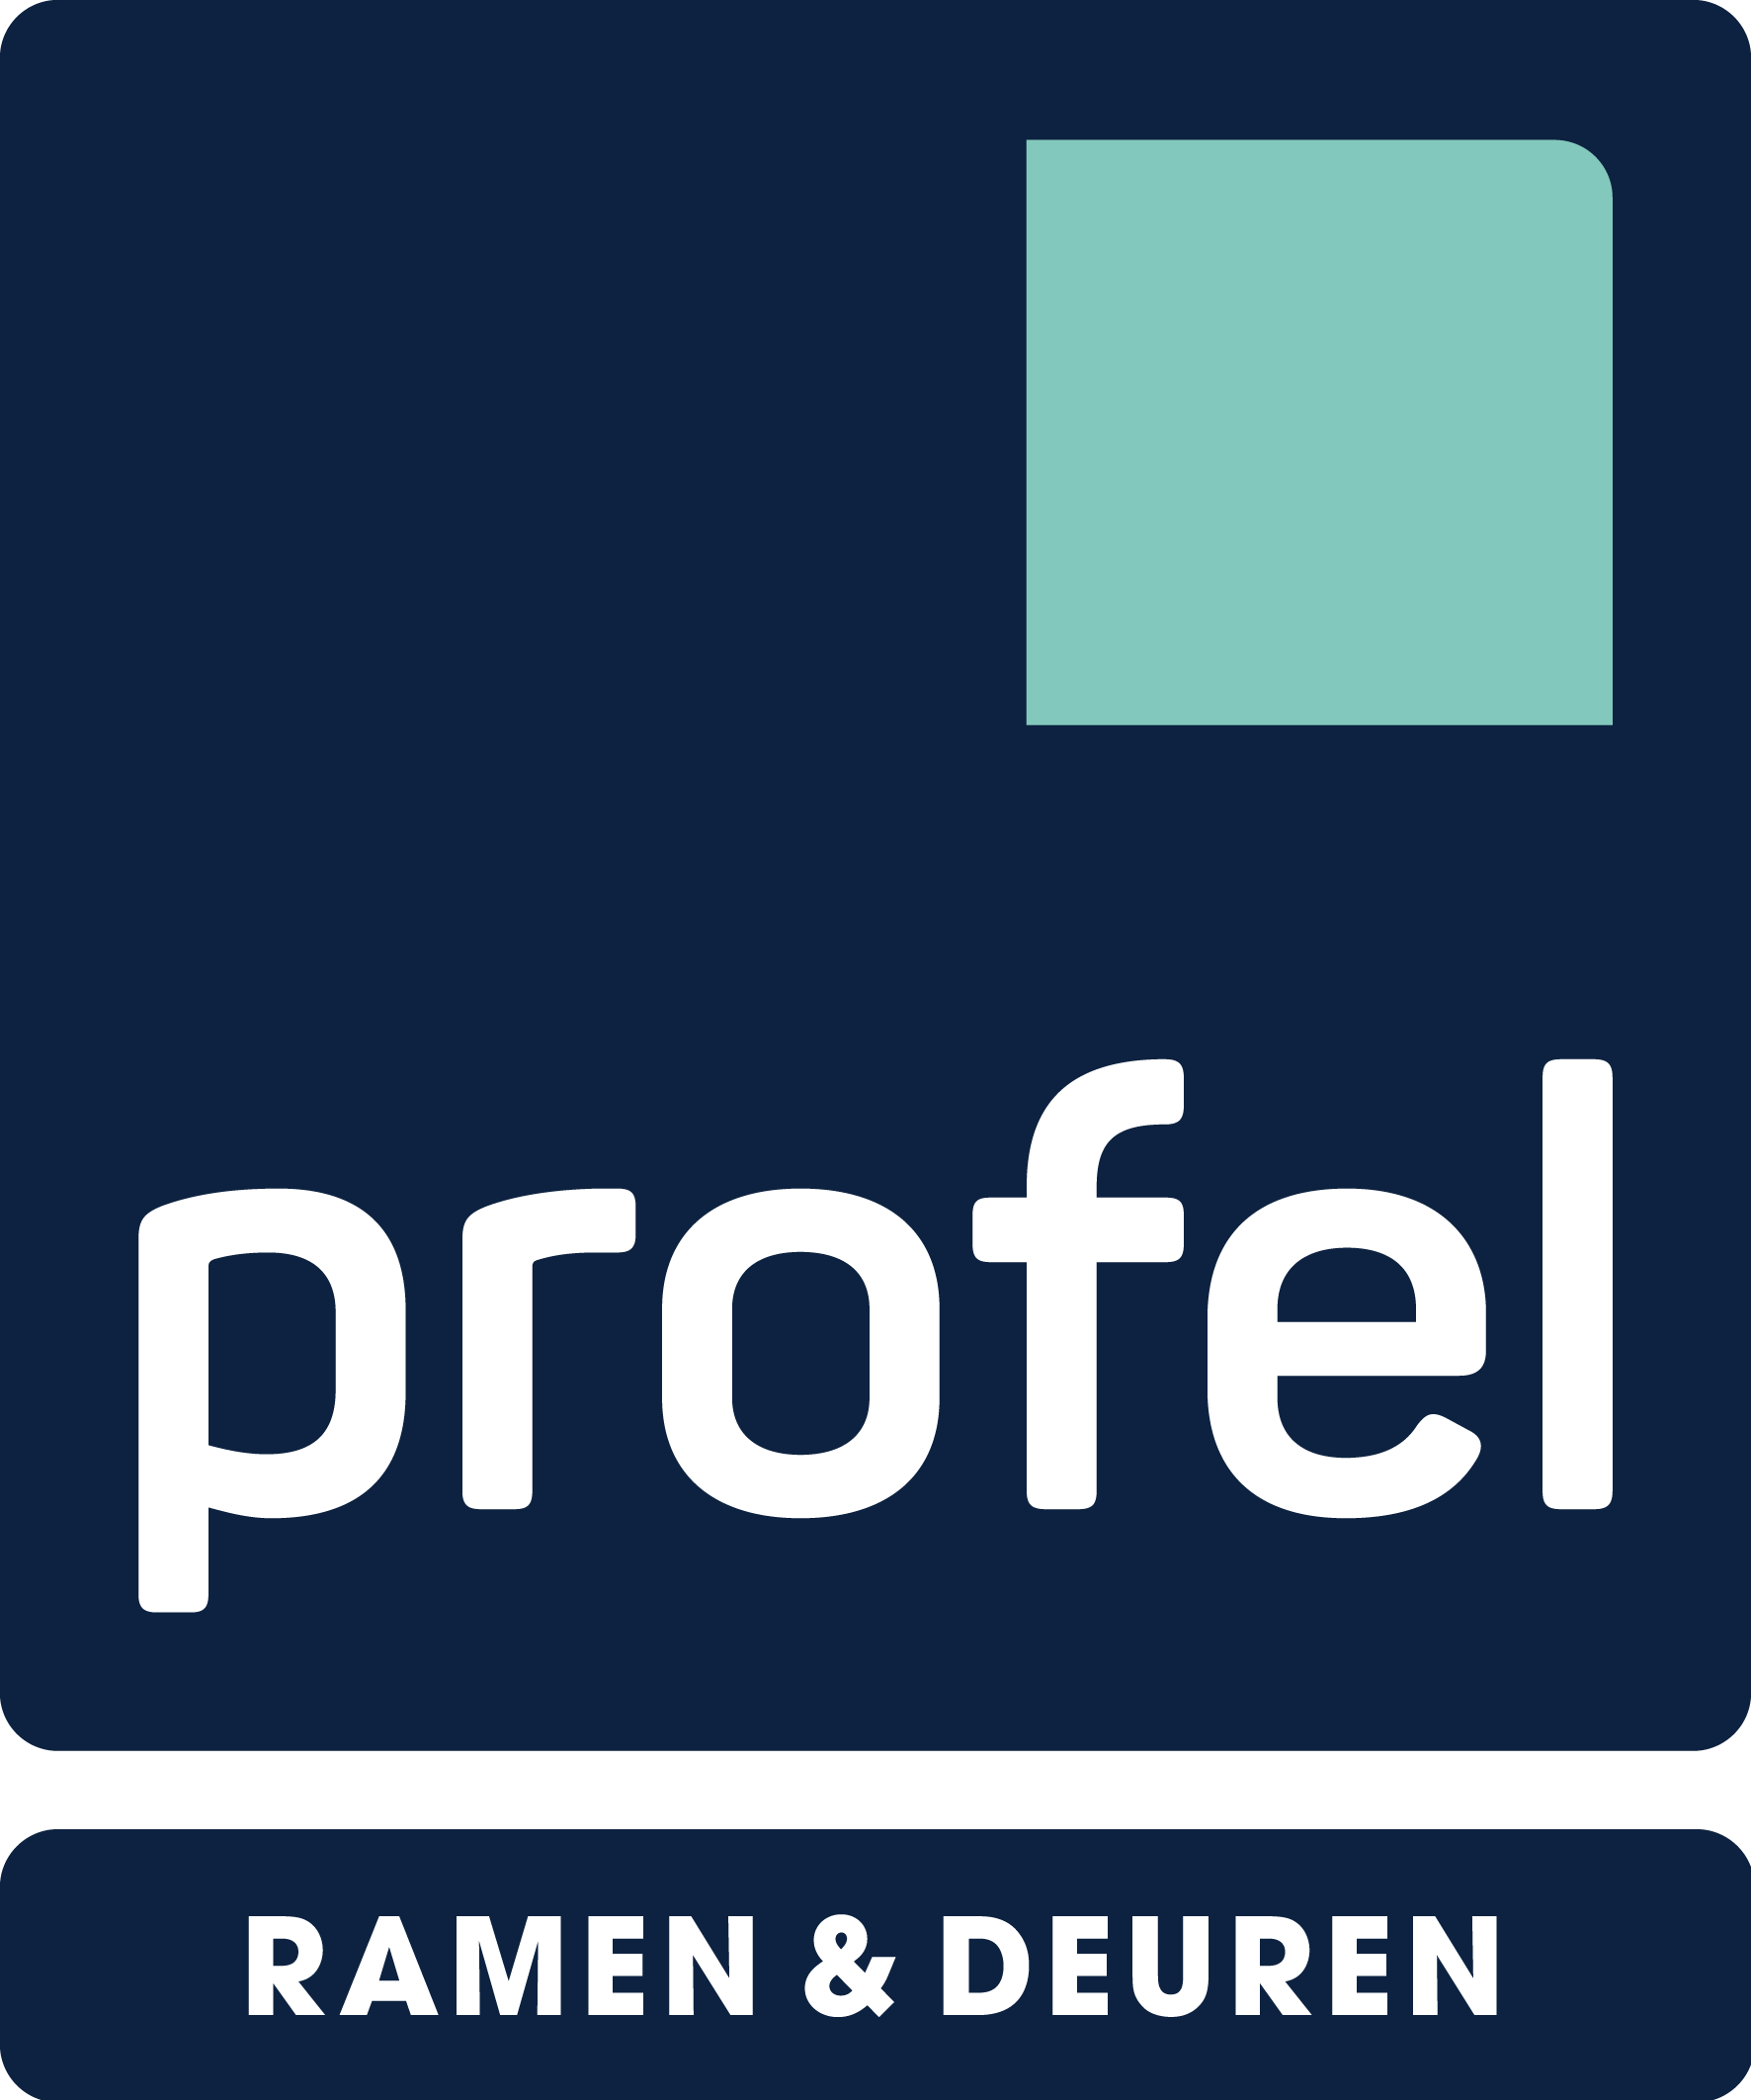 Profel logo